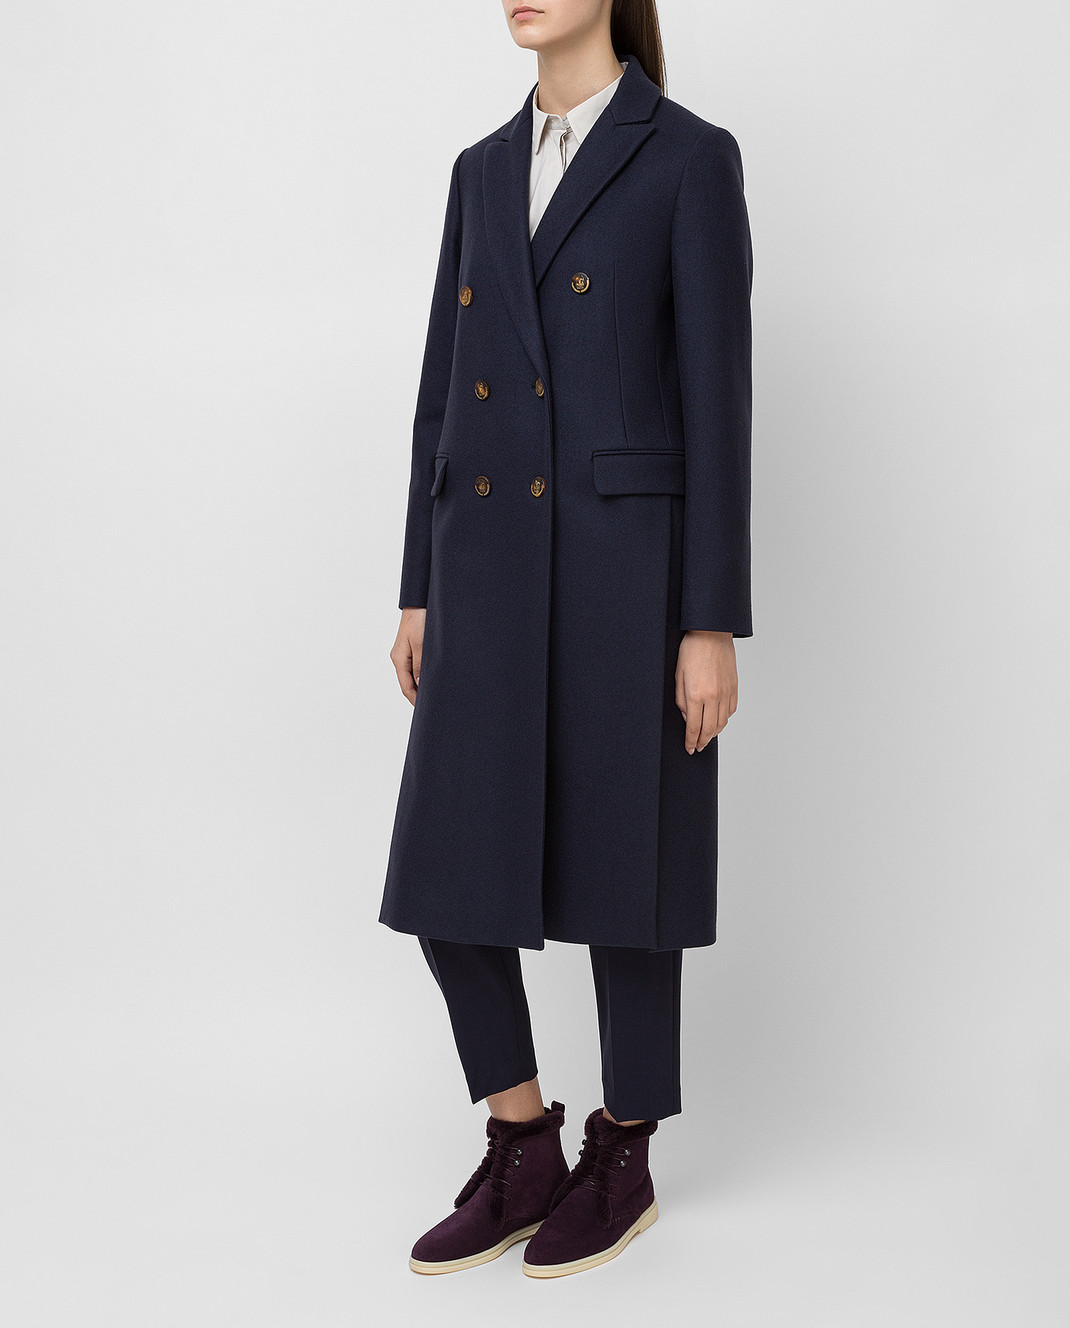 Brunello Cucinelli Темно-синее пальто из кашемира MA5324963 изображение 3